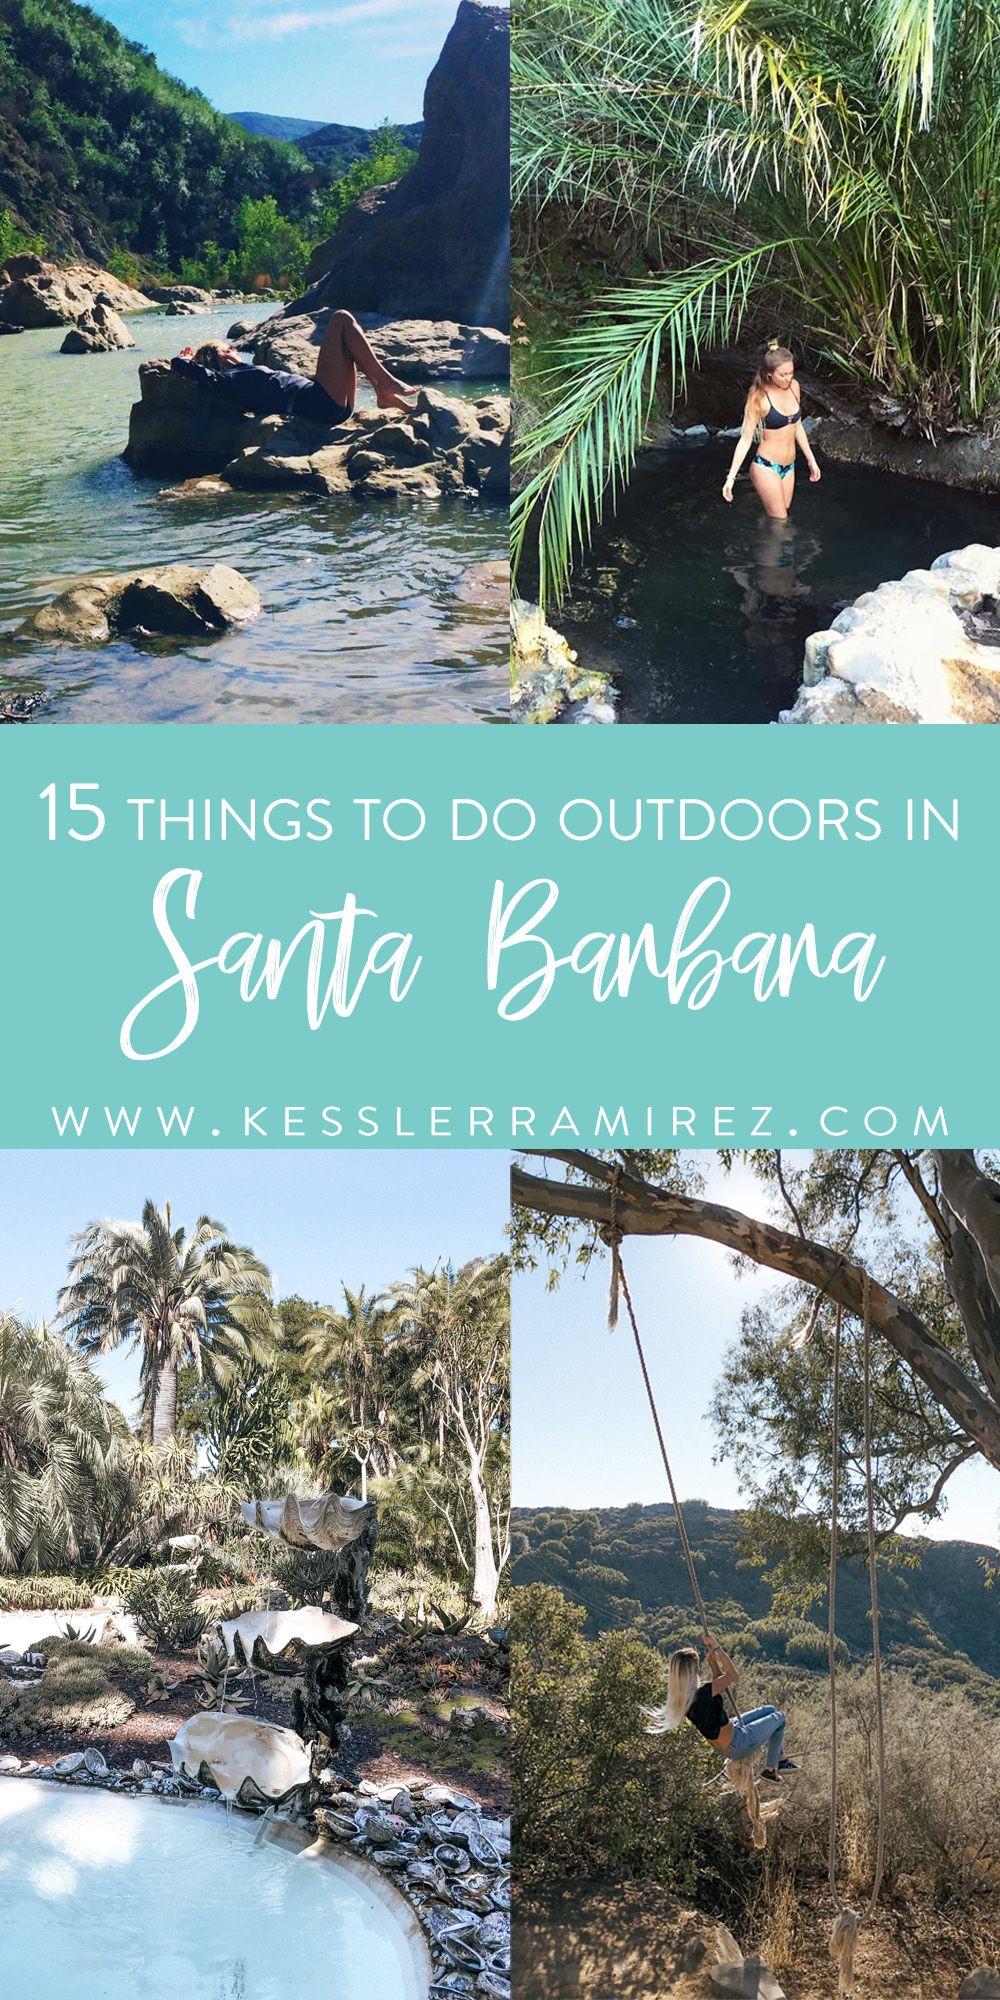 15 Things to Do Outdoors in Santa Barbara | Kessle